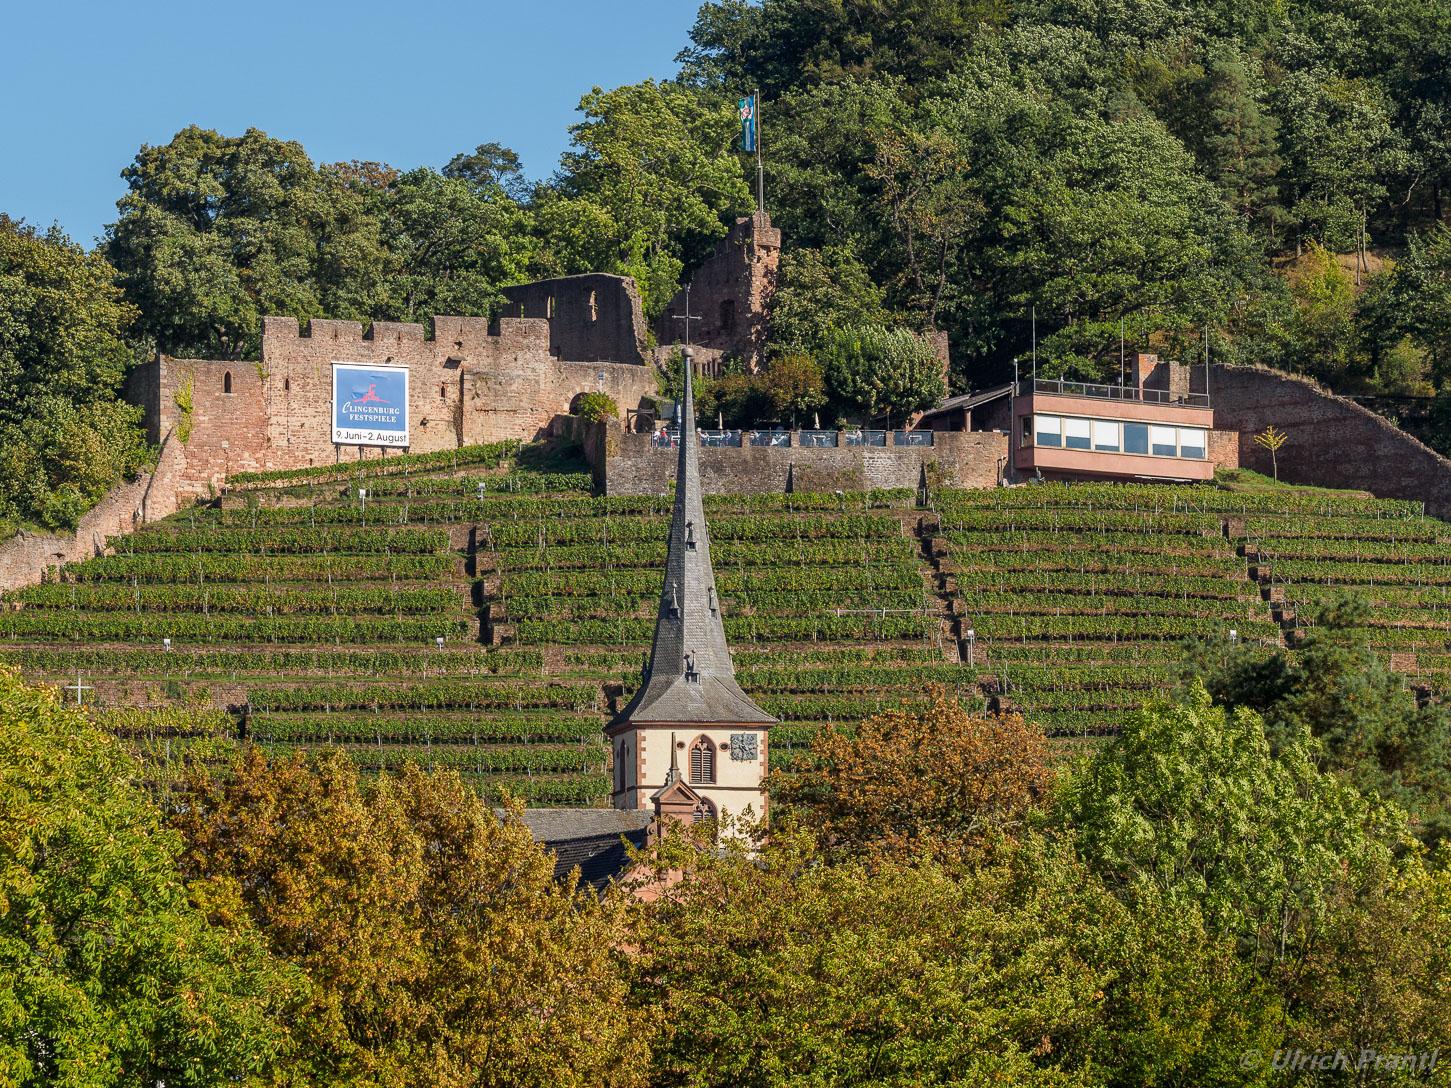 Klingenberg Burg